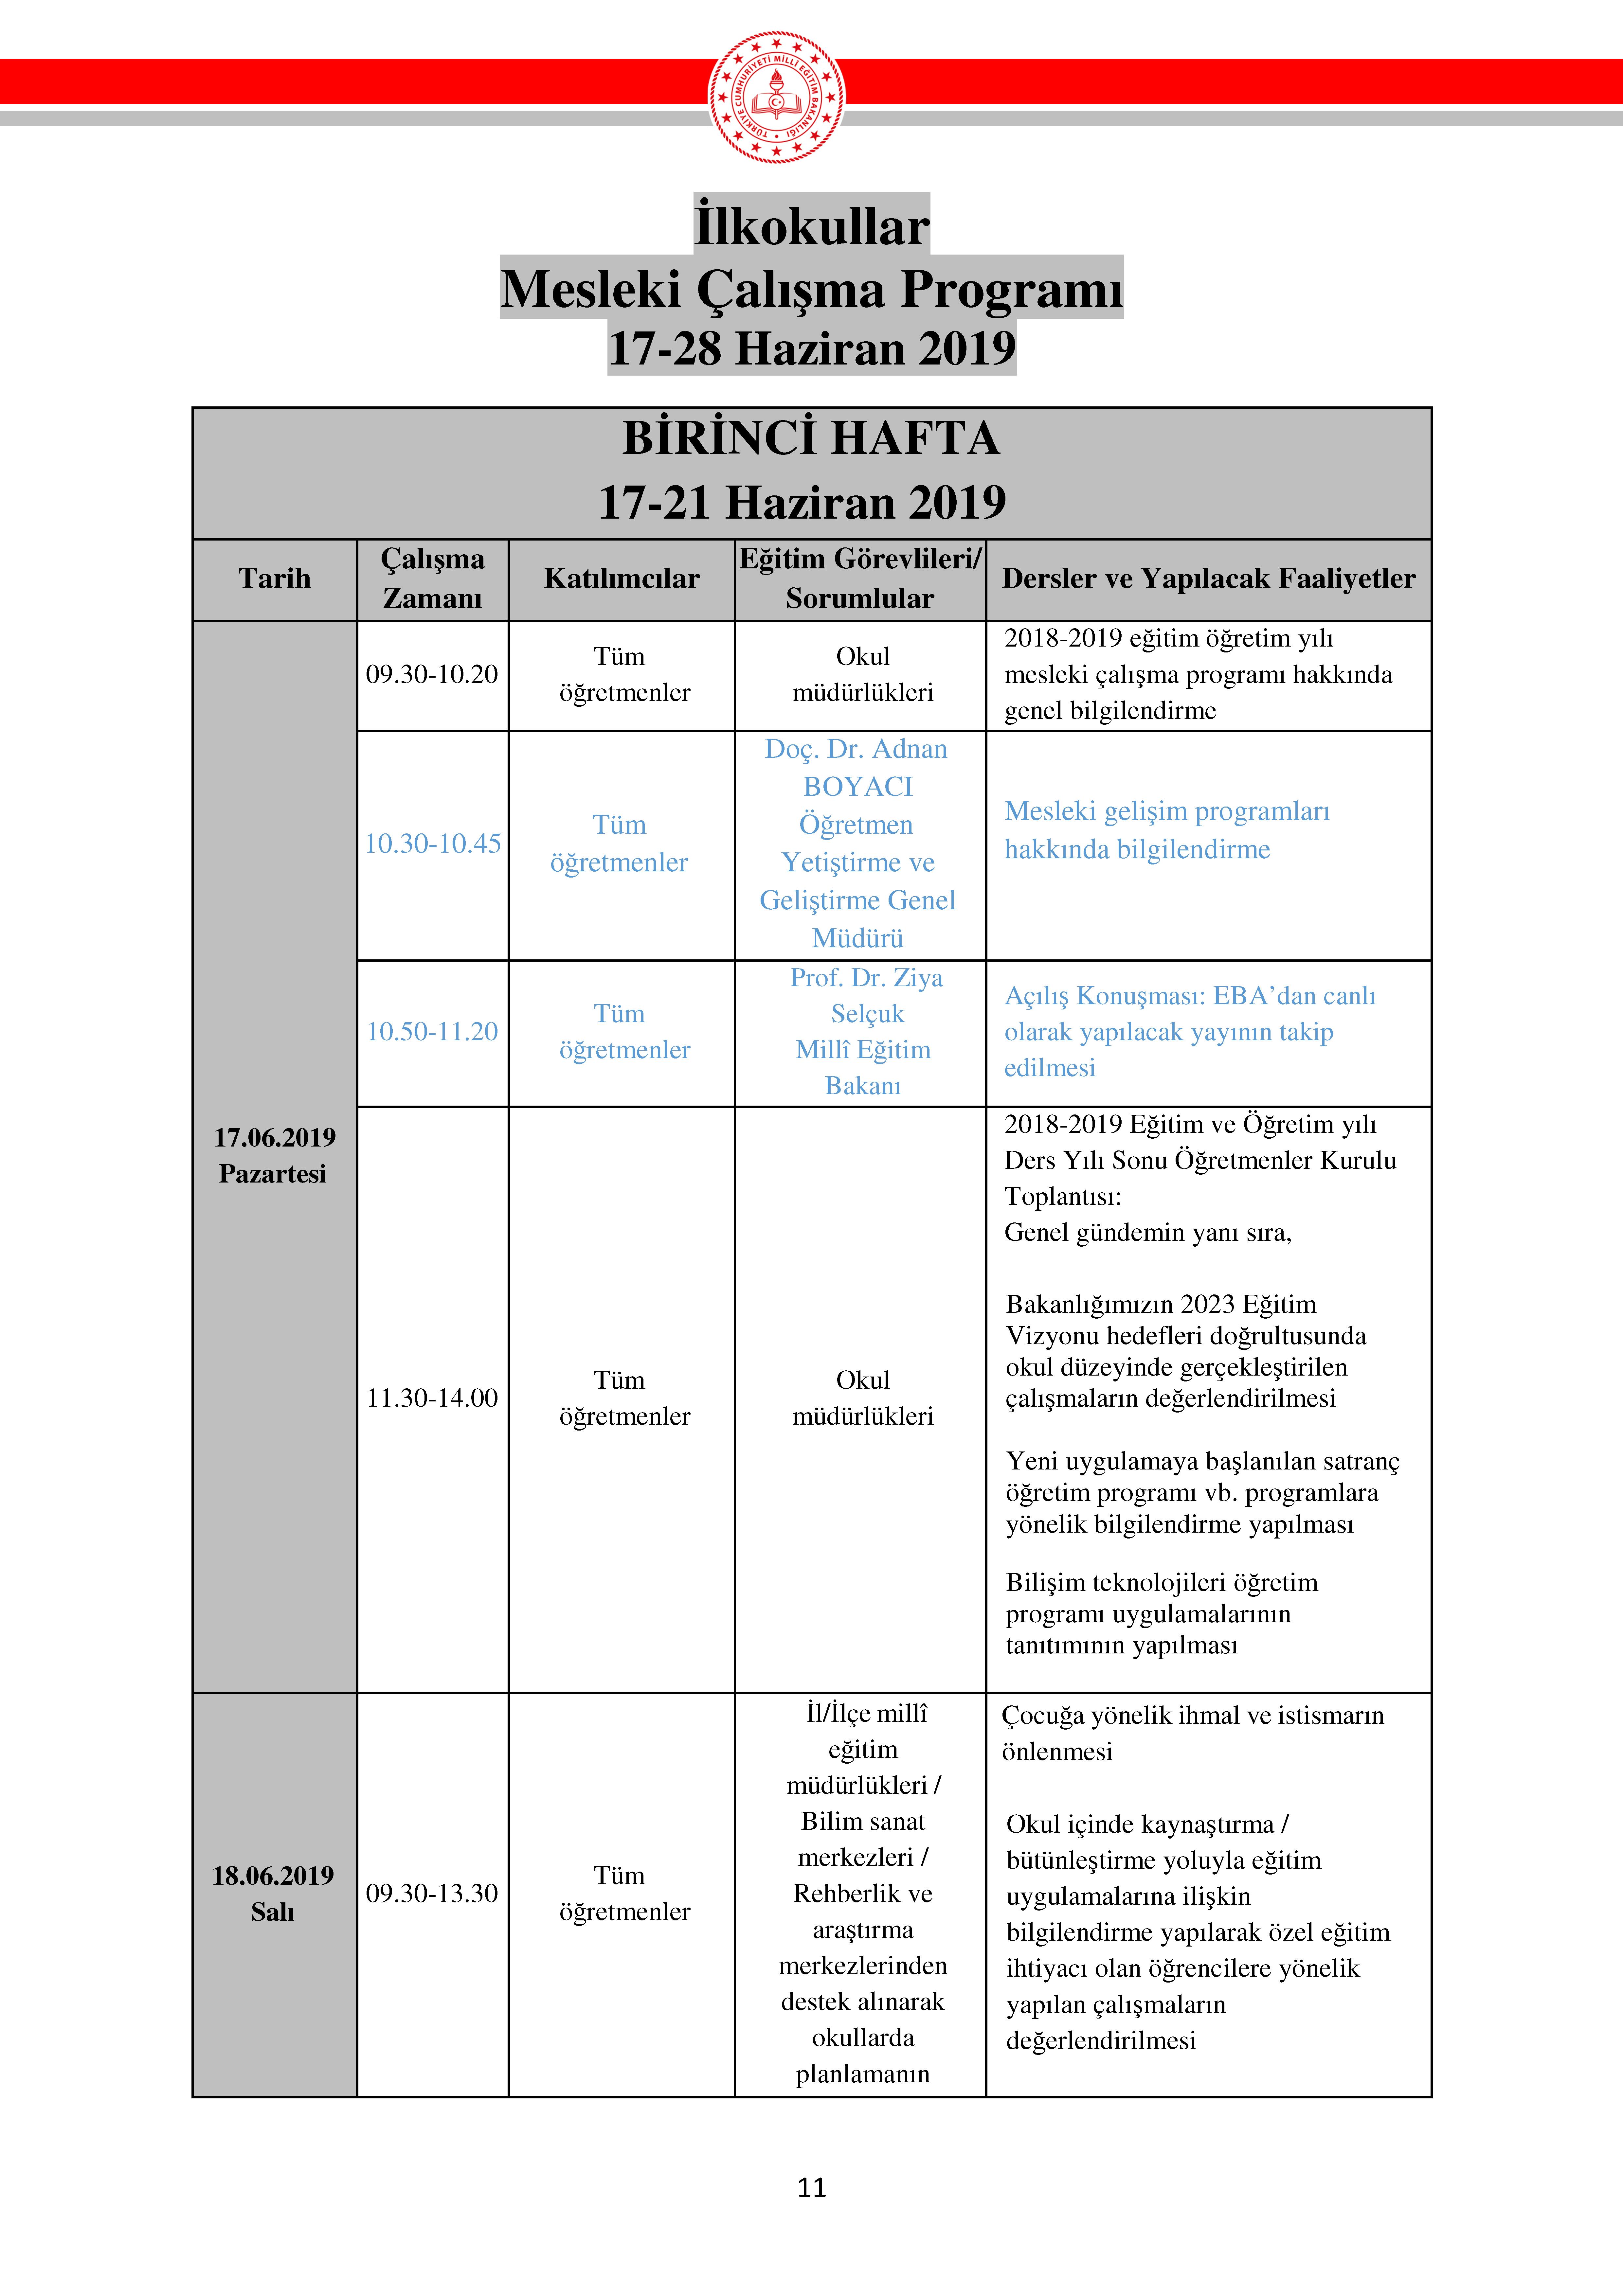 2019 Haziran Semineri Calisma Programi Anaokulu Ilkokul Ortaokul